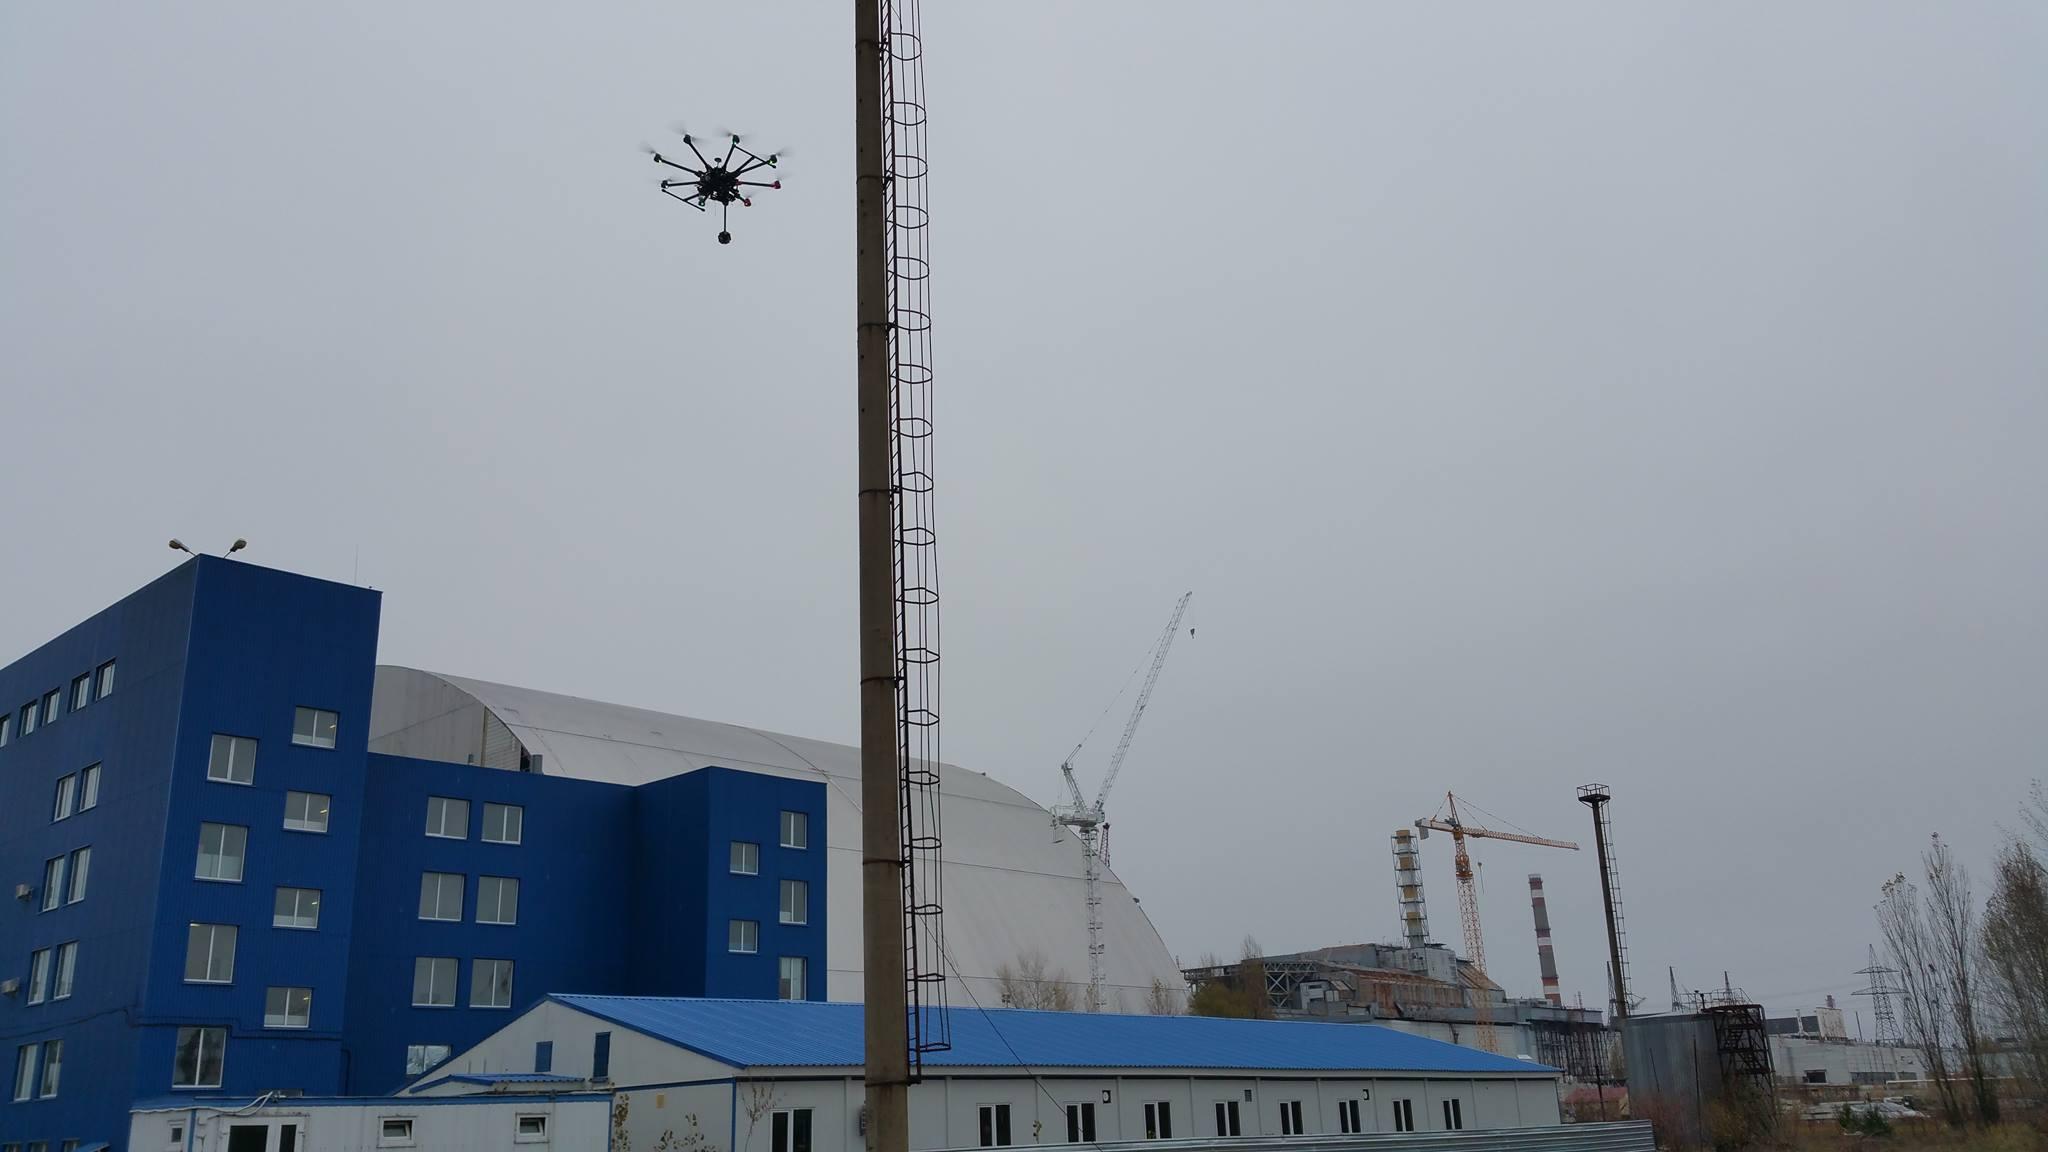 Полёт дрона вблизи АЭС. Фото: facebook.com/chernobyl360VR